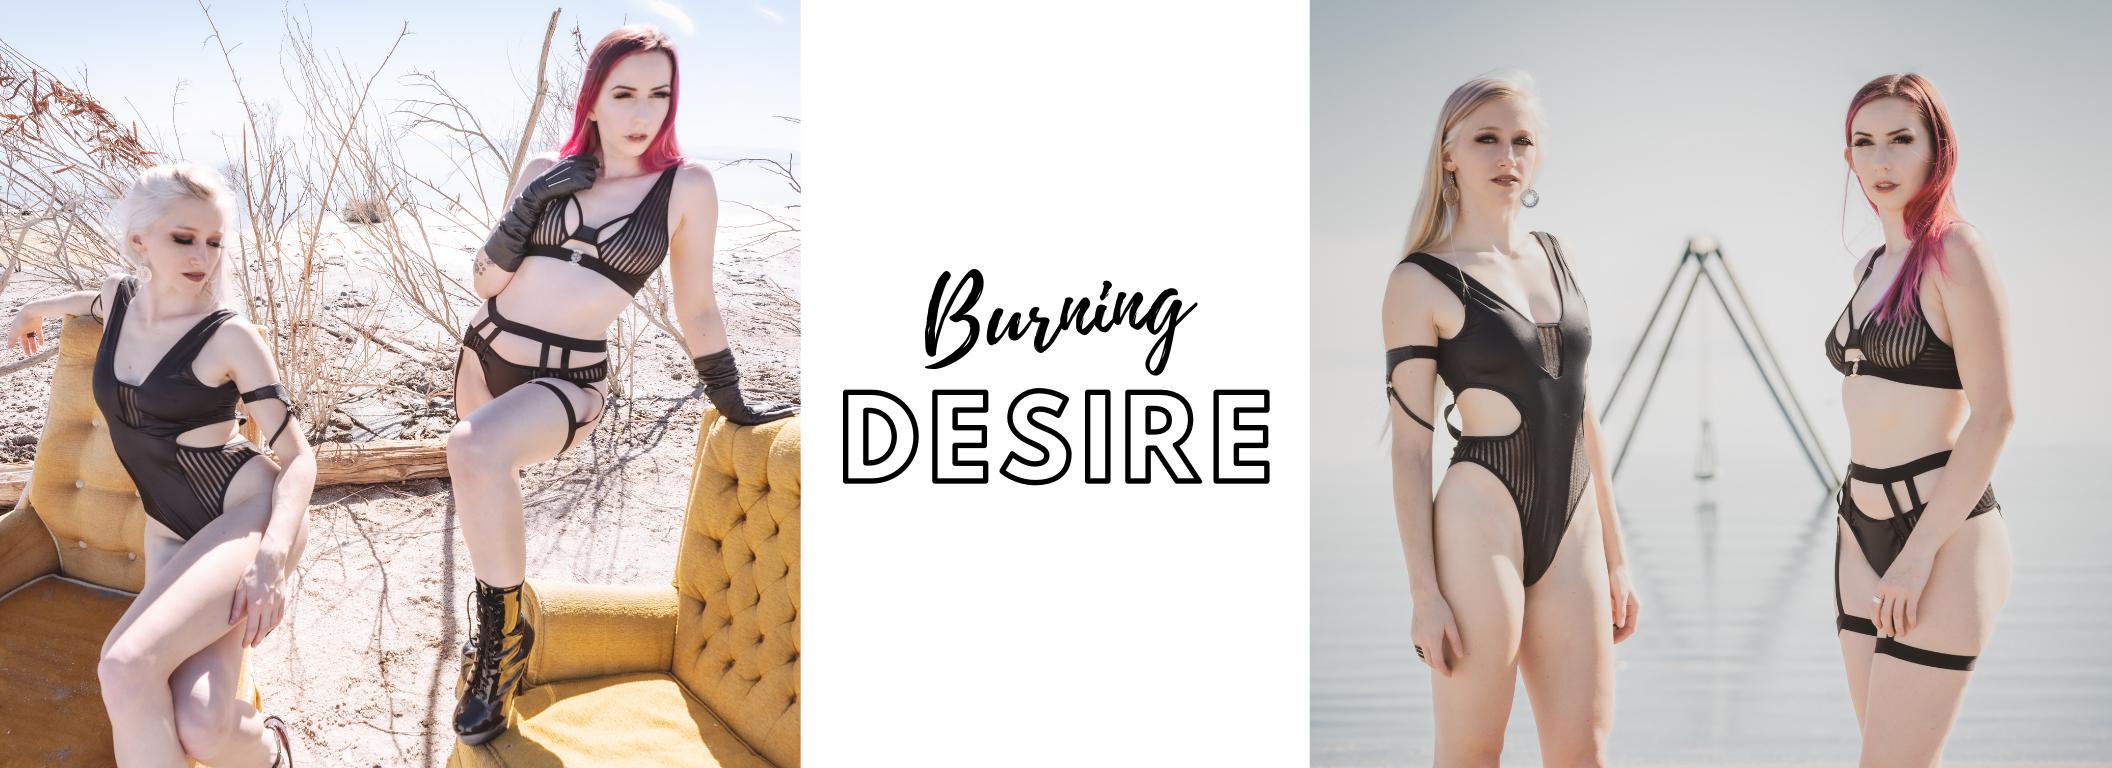 burning-desire-black-burning-man-lingerie.png